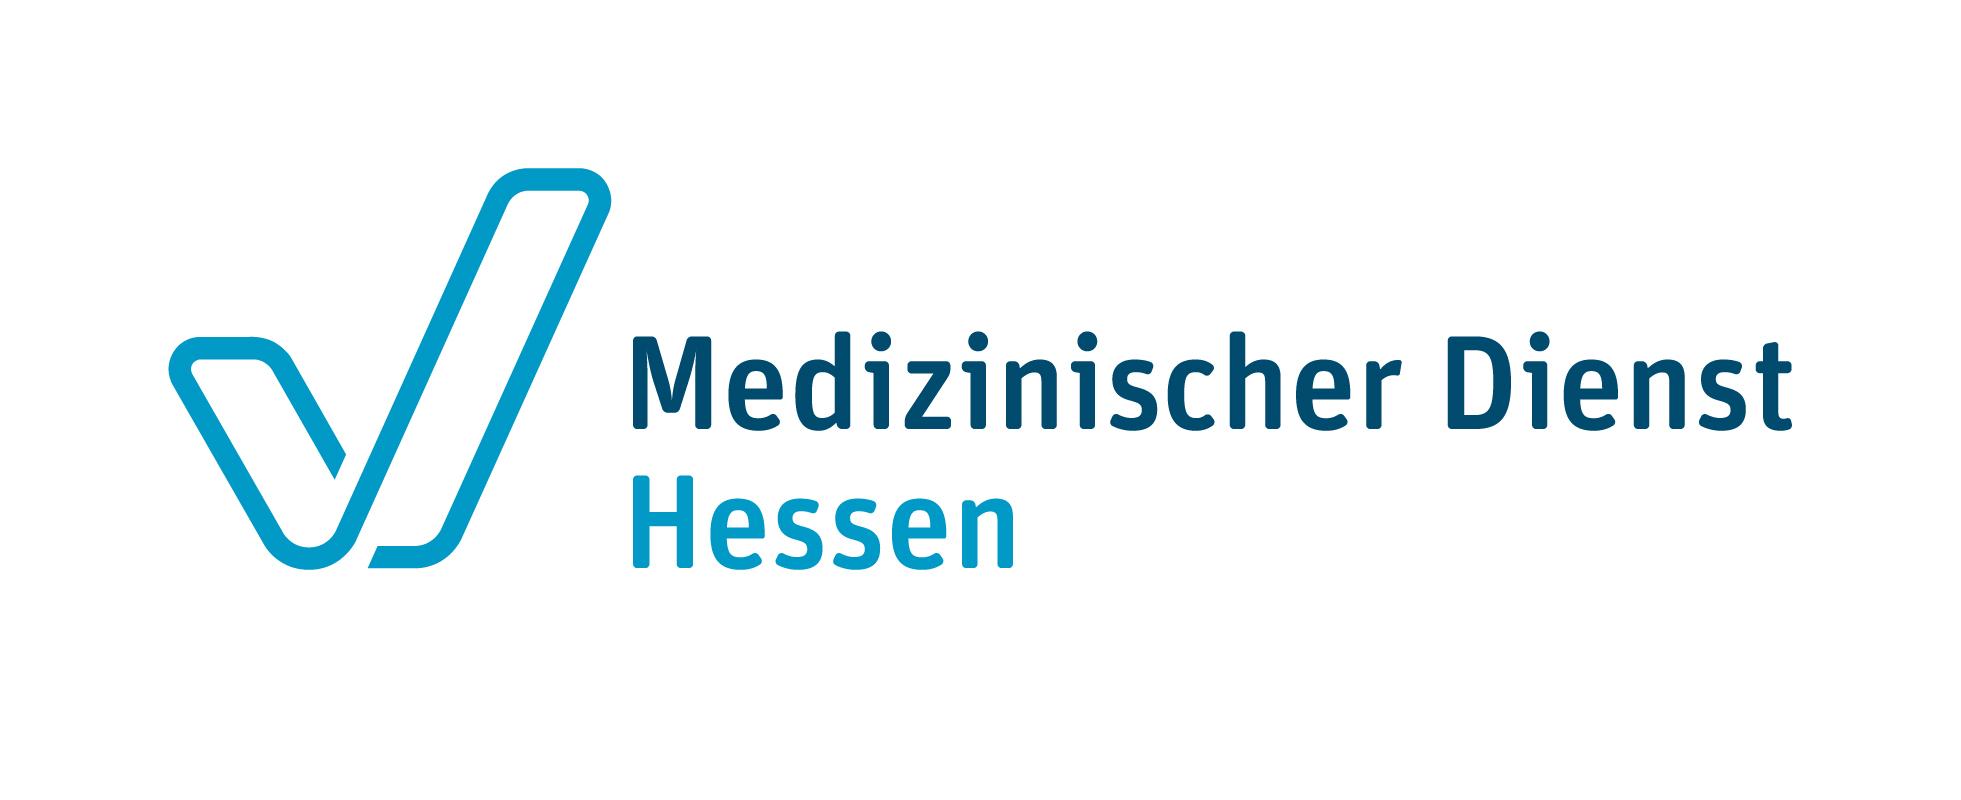 MDK Hessen